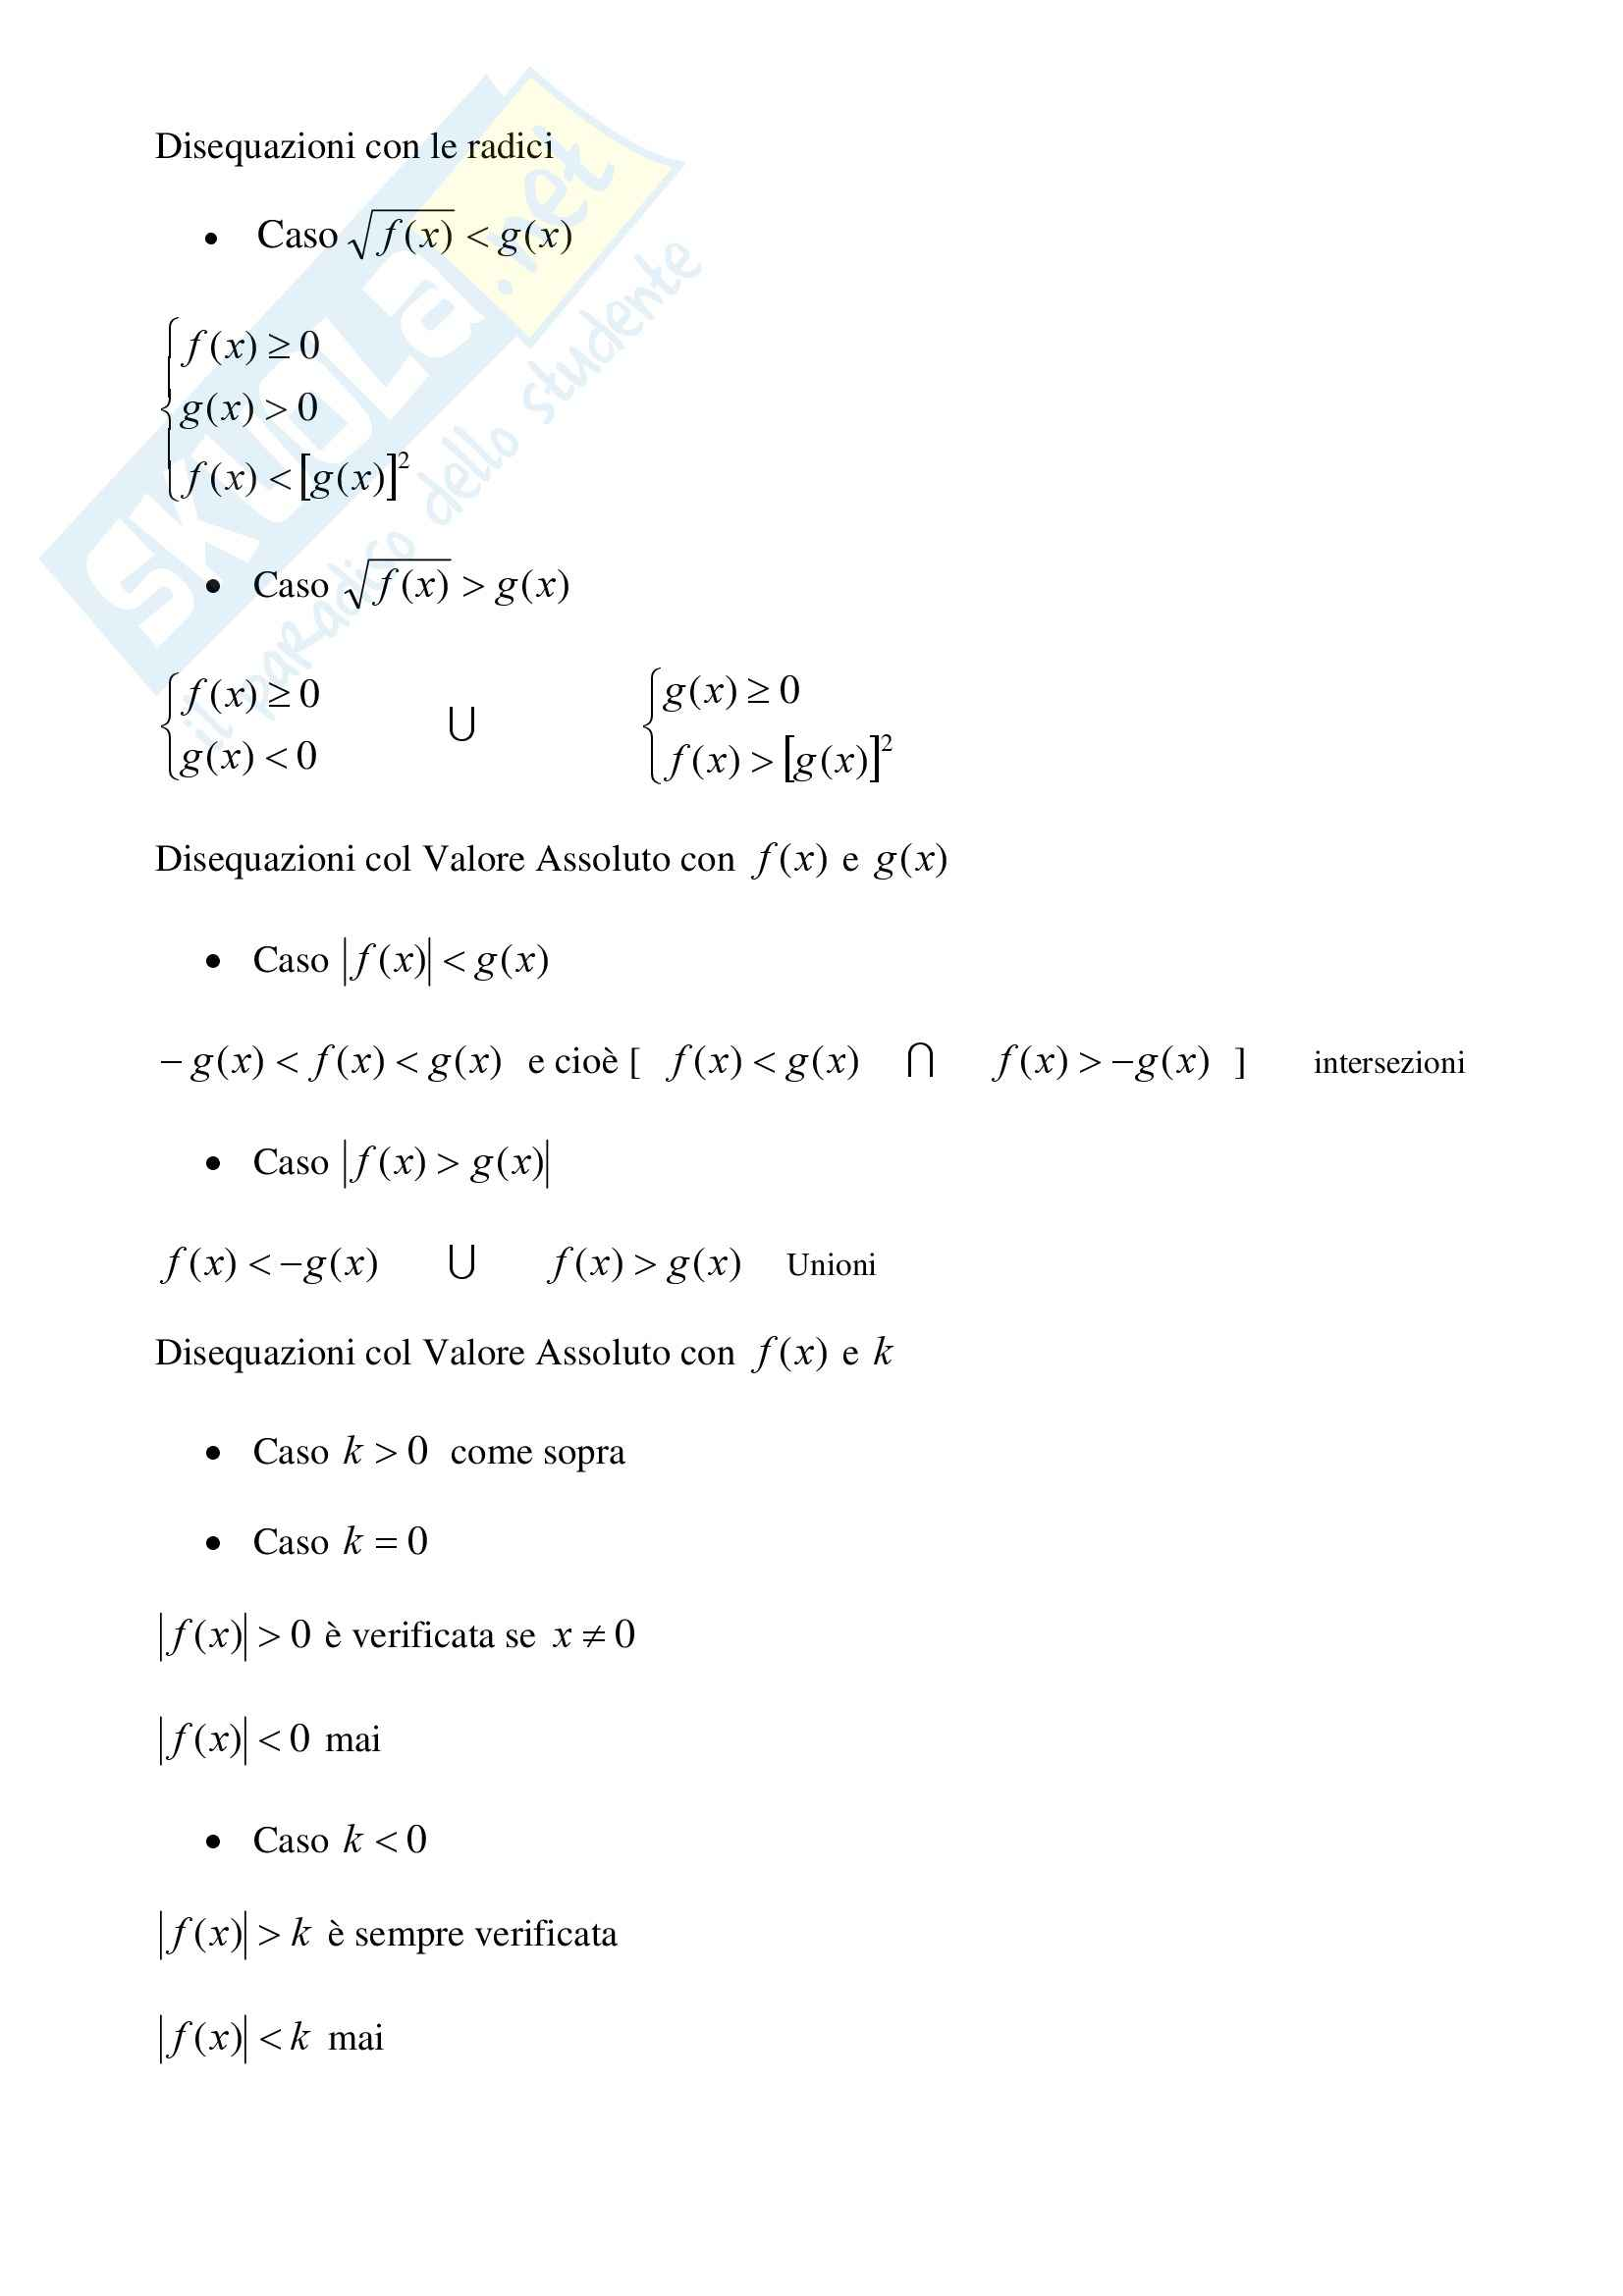 Matematica - Schema risoluzione disequazioni